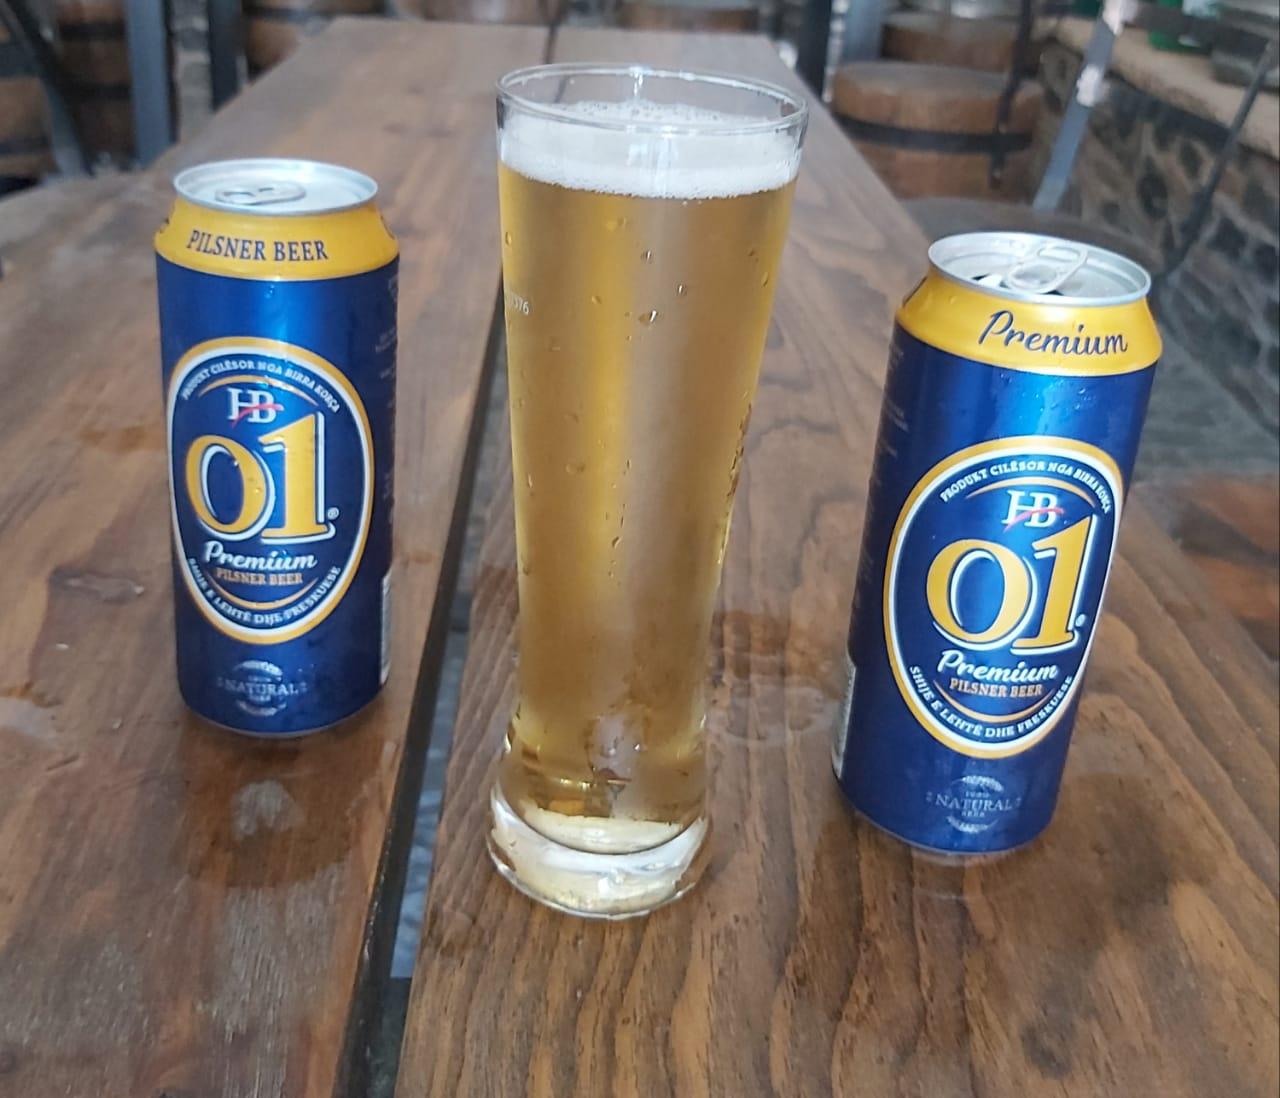 Birra 01 Korca